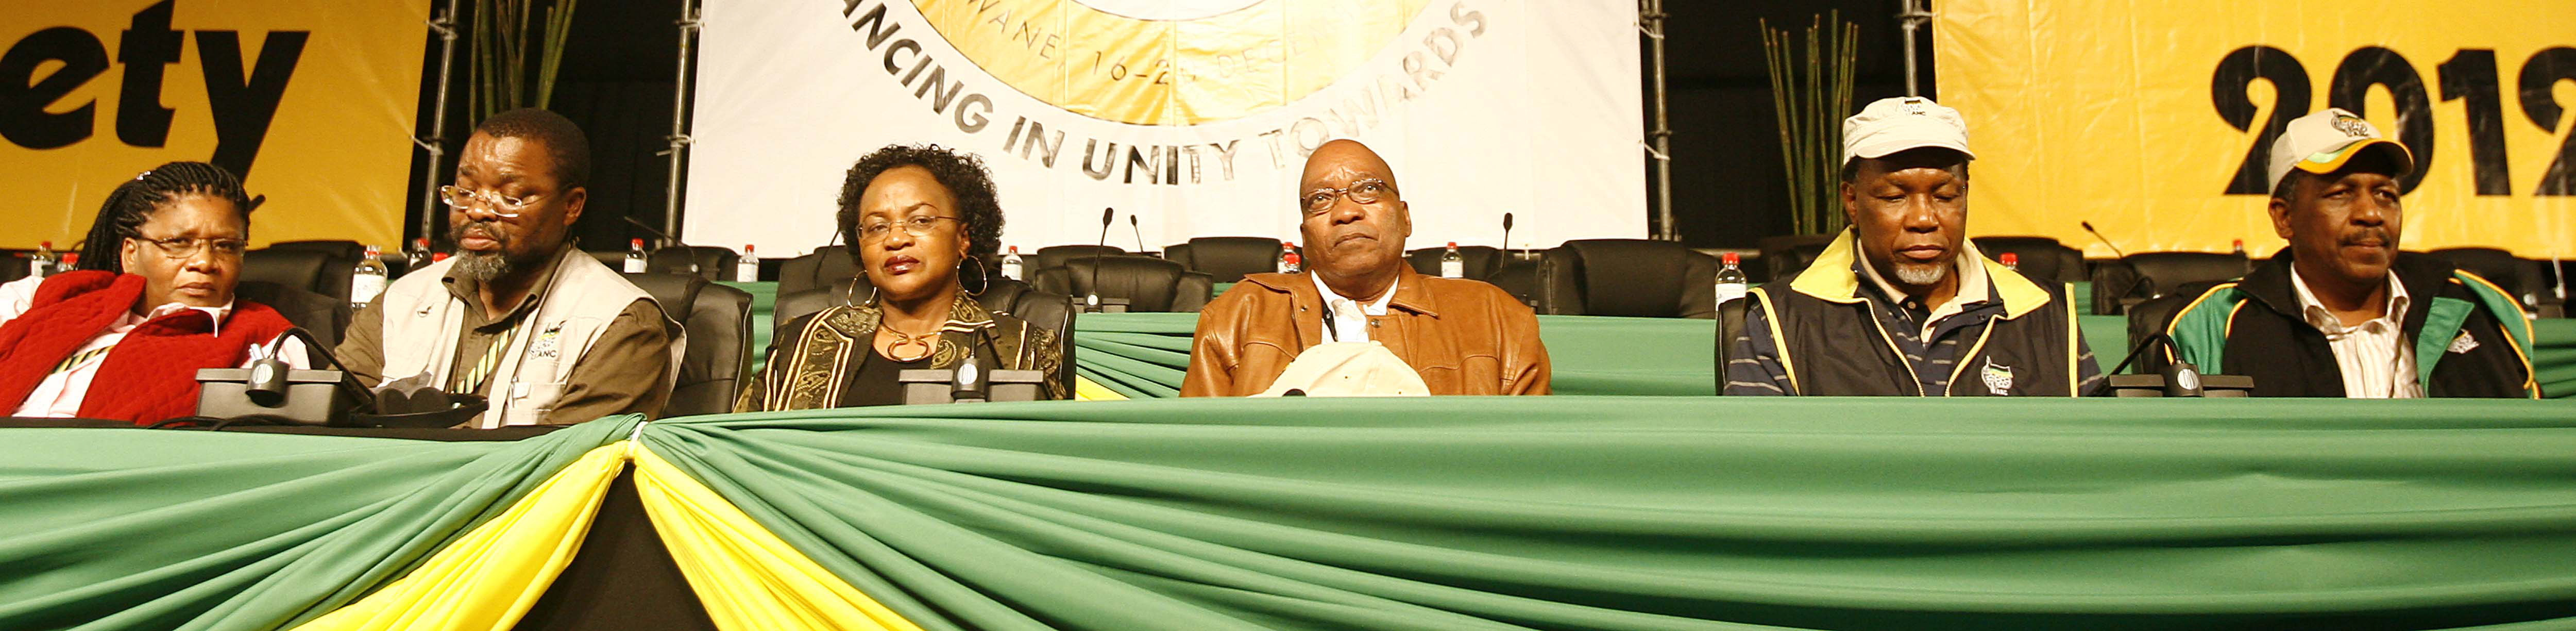 Jacob Zuma and the top six elected at Polokwane on 18 December 2007: Thandi Modise, Gwede Mantashe, Baleka...